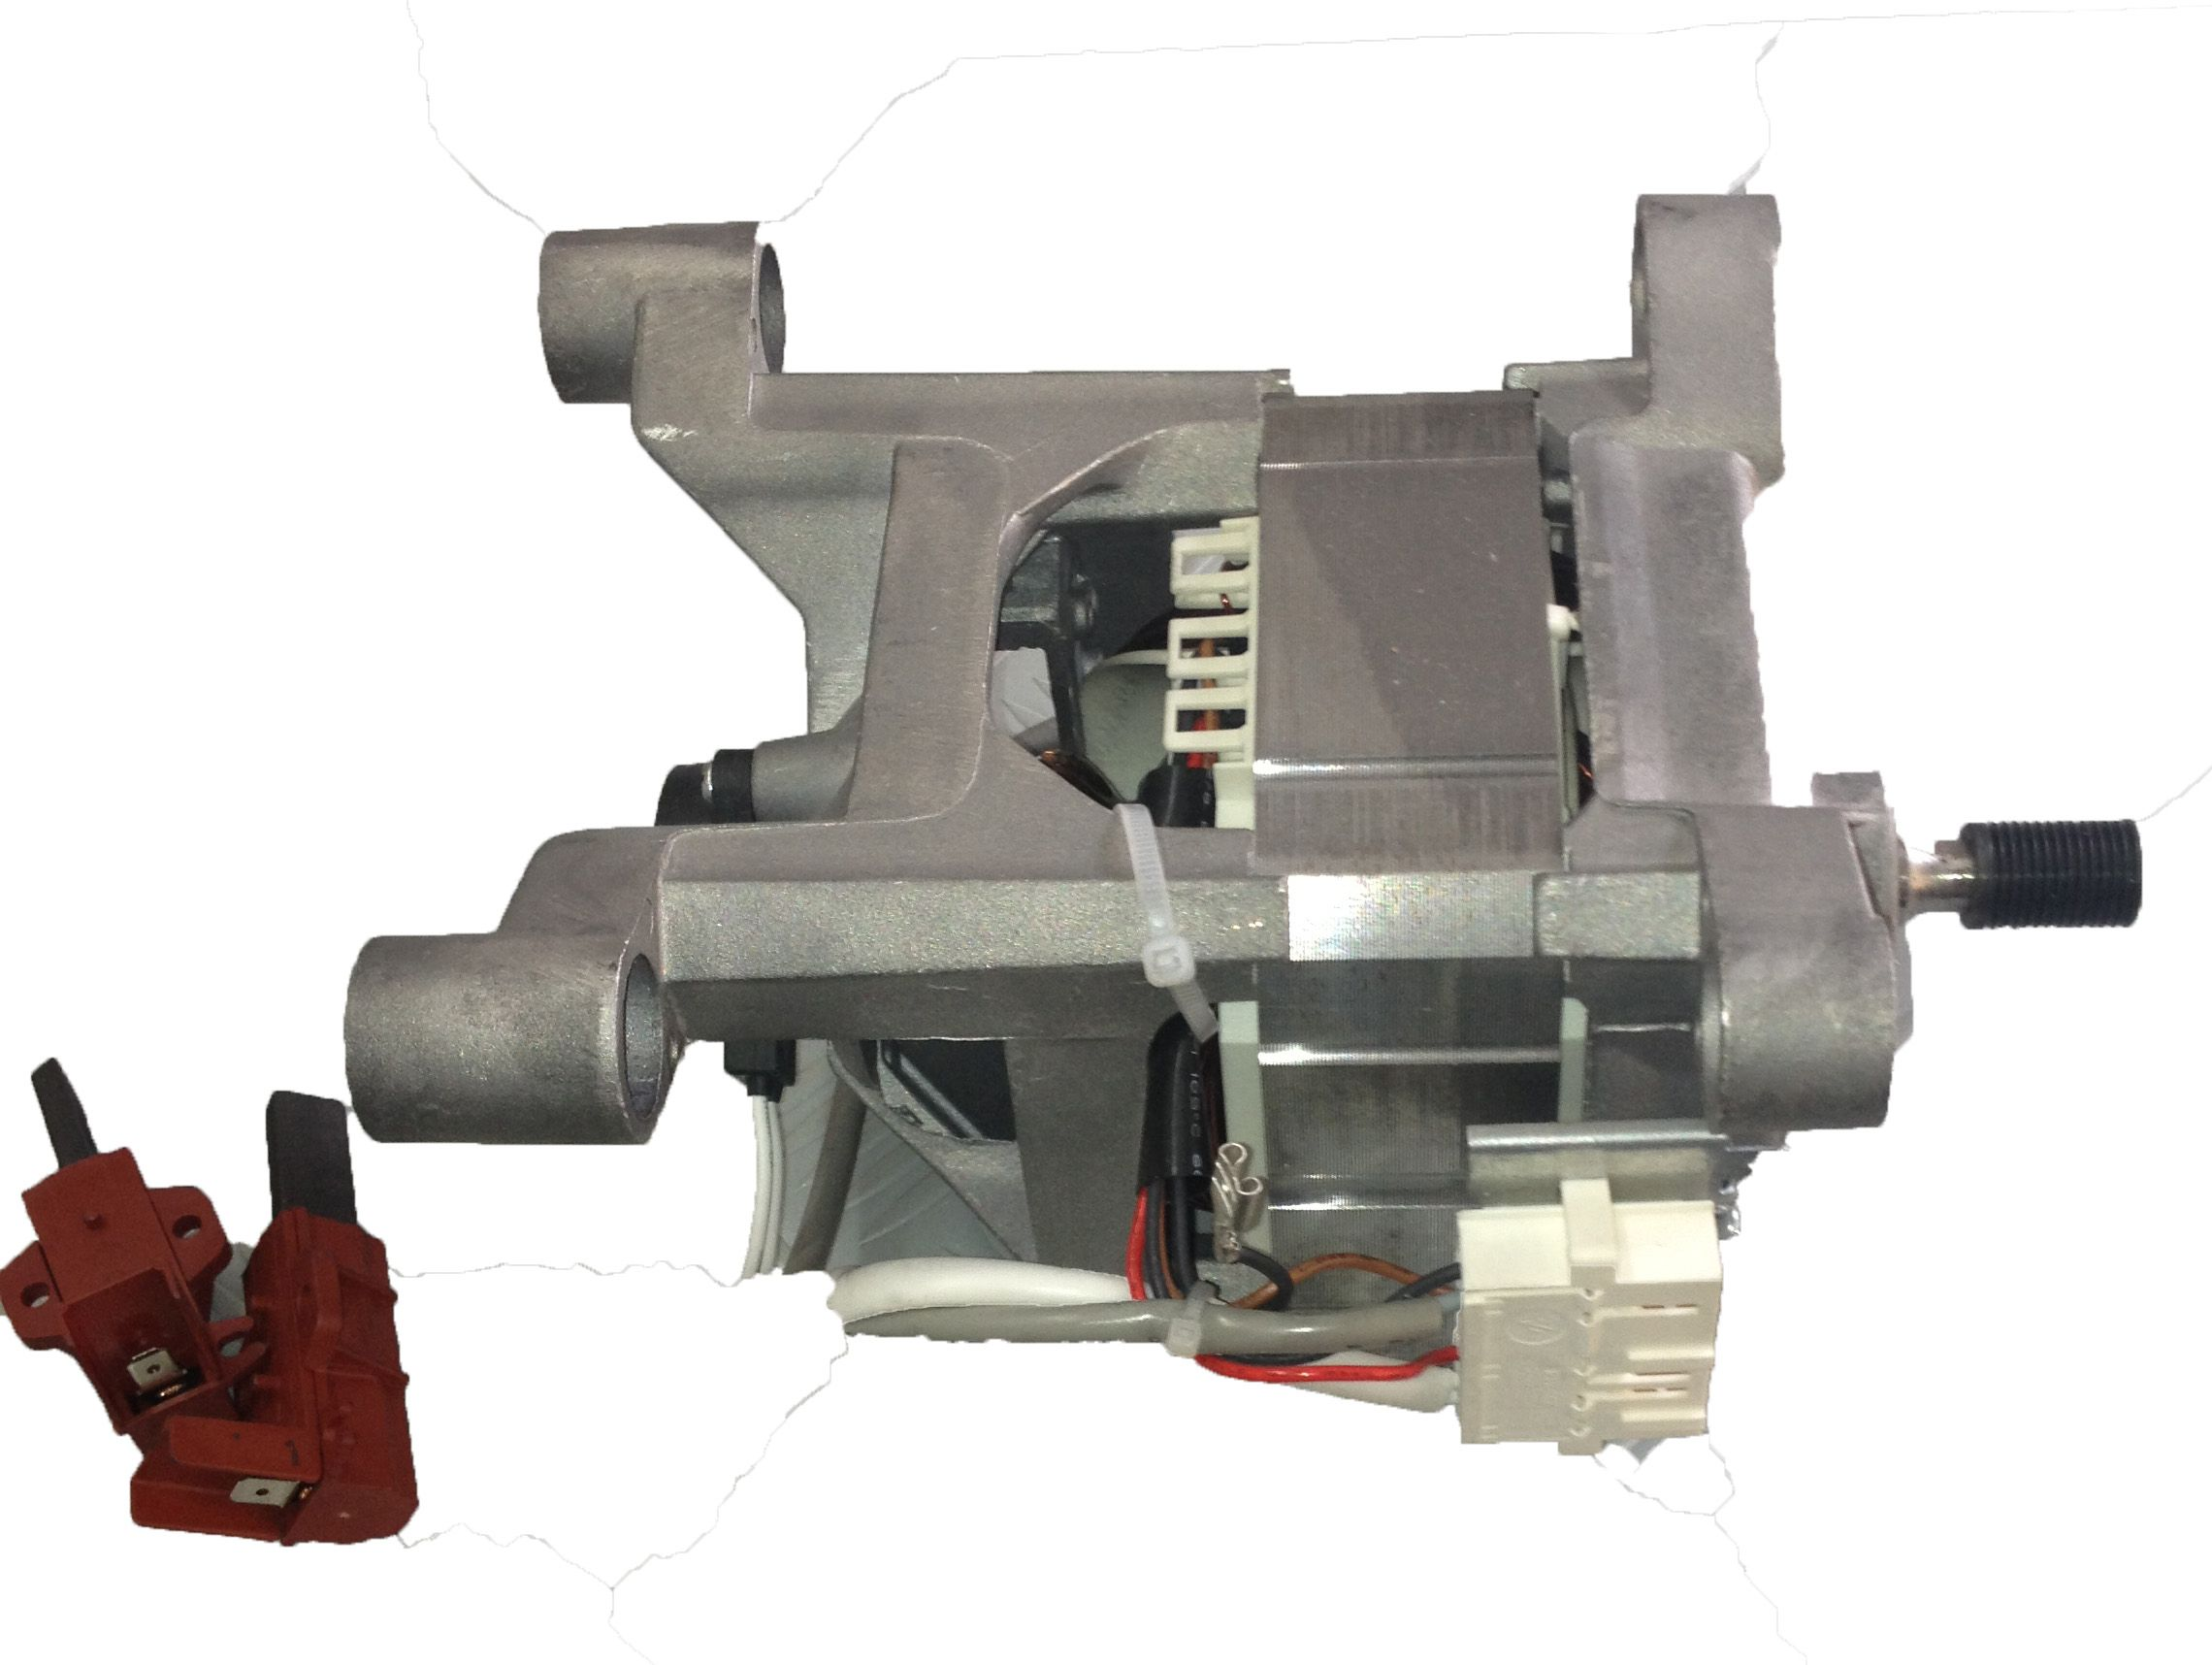 Schema Elettrico Lavatrice : Lavatrici ariston u2013 hotpoint indesit u2013 errore f02 codici errore